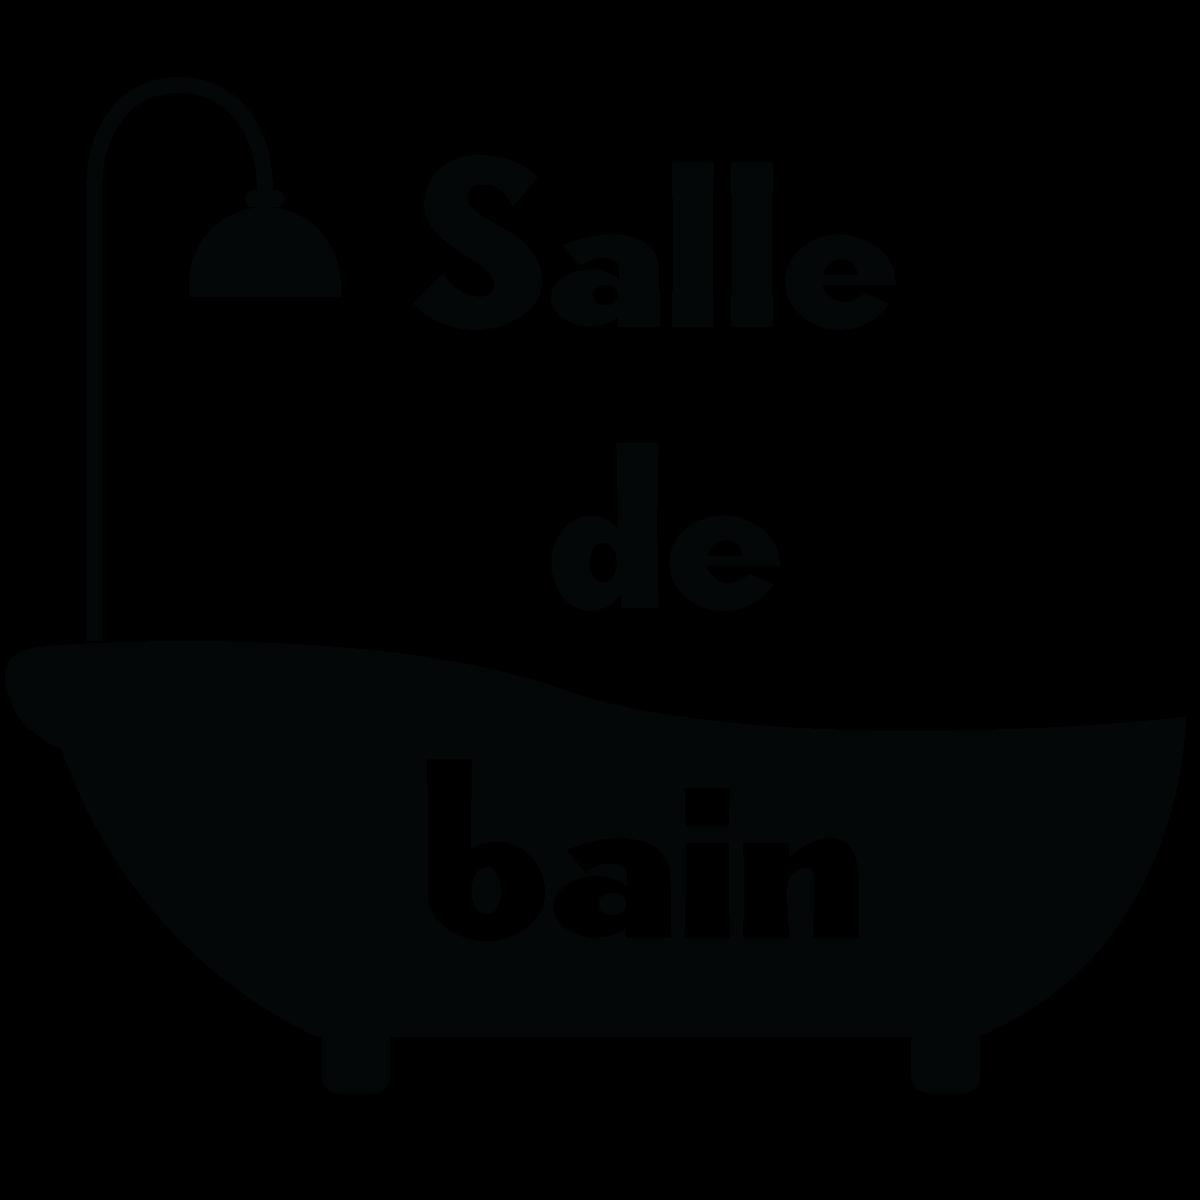 Sticker porte salle de bain baignoire stickers salle de bain et wc salle de bain ambiance - Stickers salle de bain ...